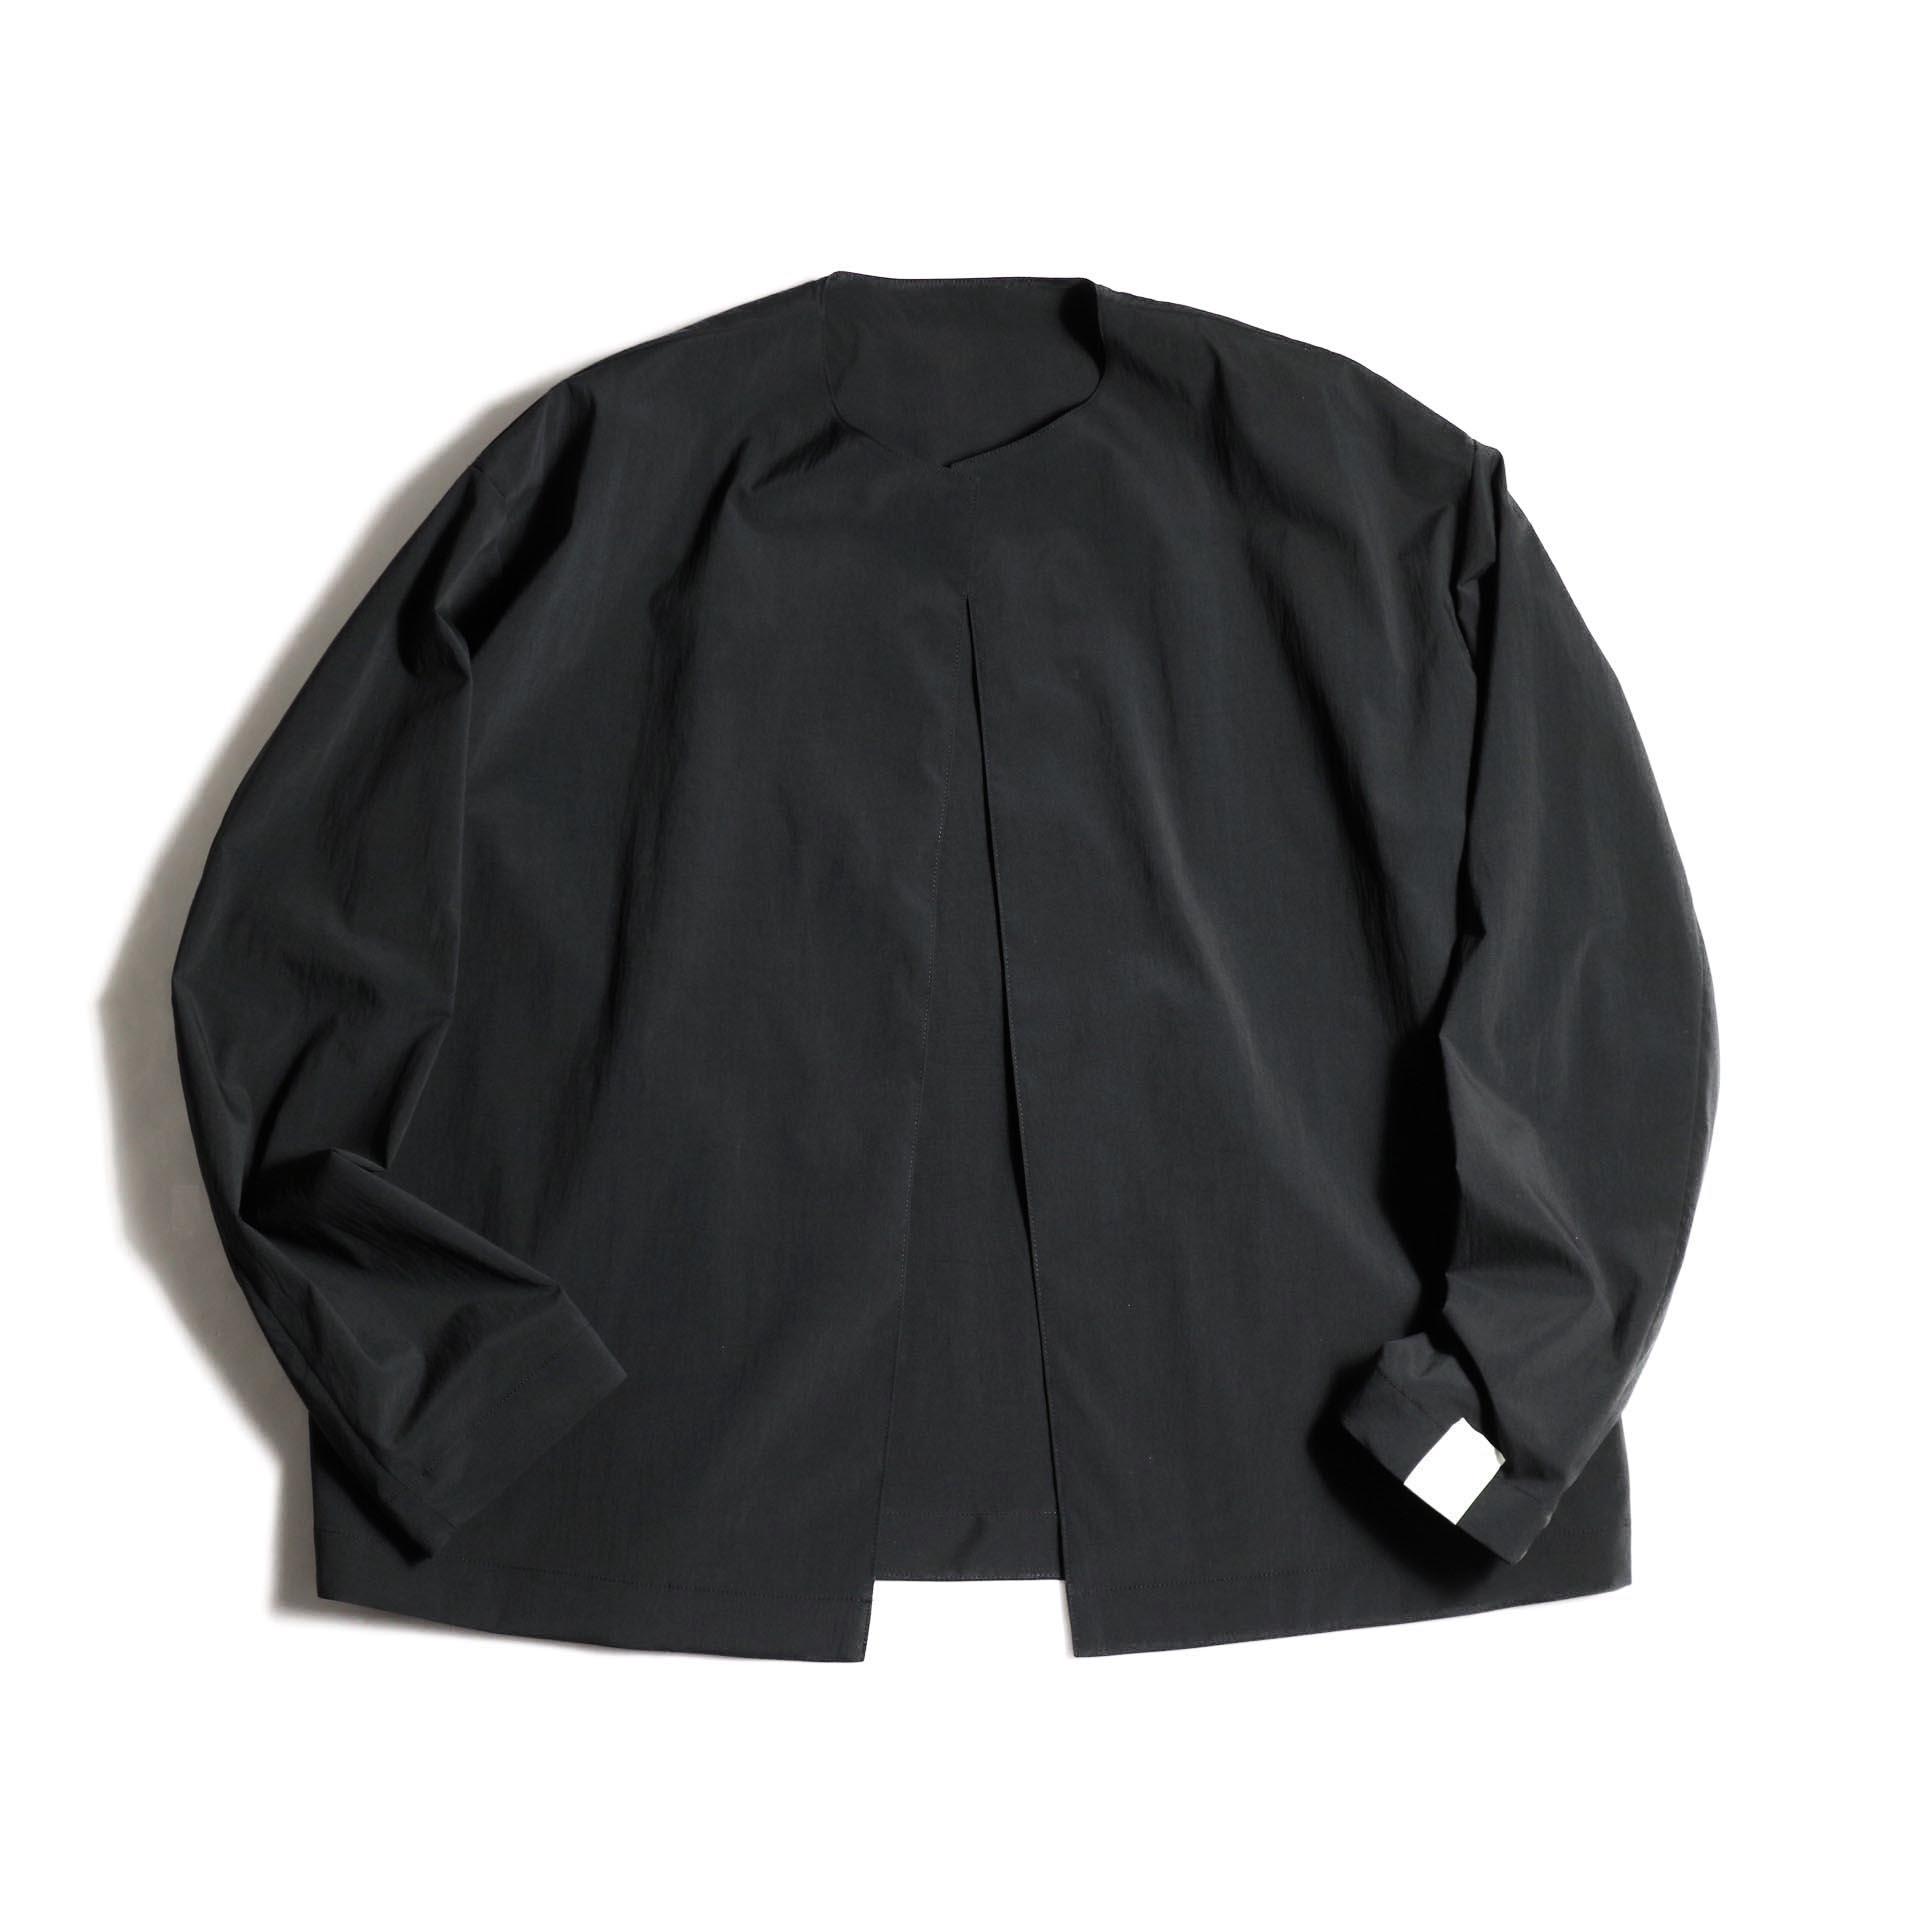 N.HOOLYWOOD / 1202-BL03-007 Collarless Jacket (Black)